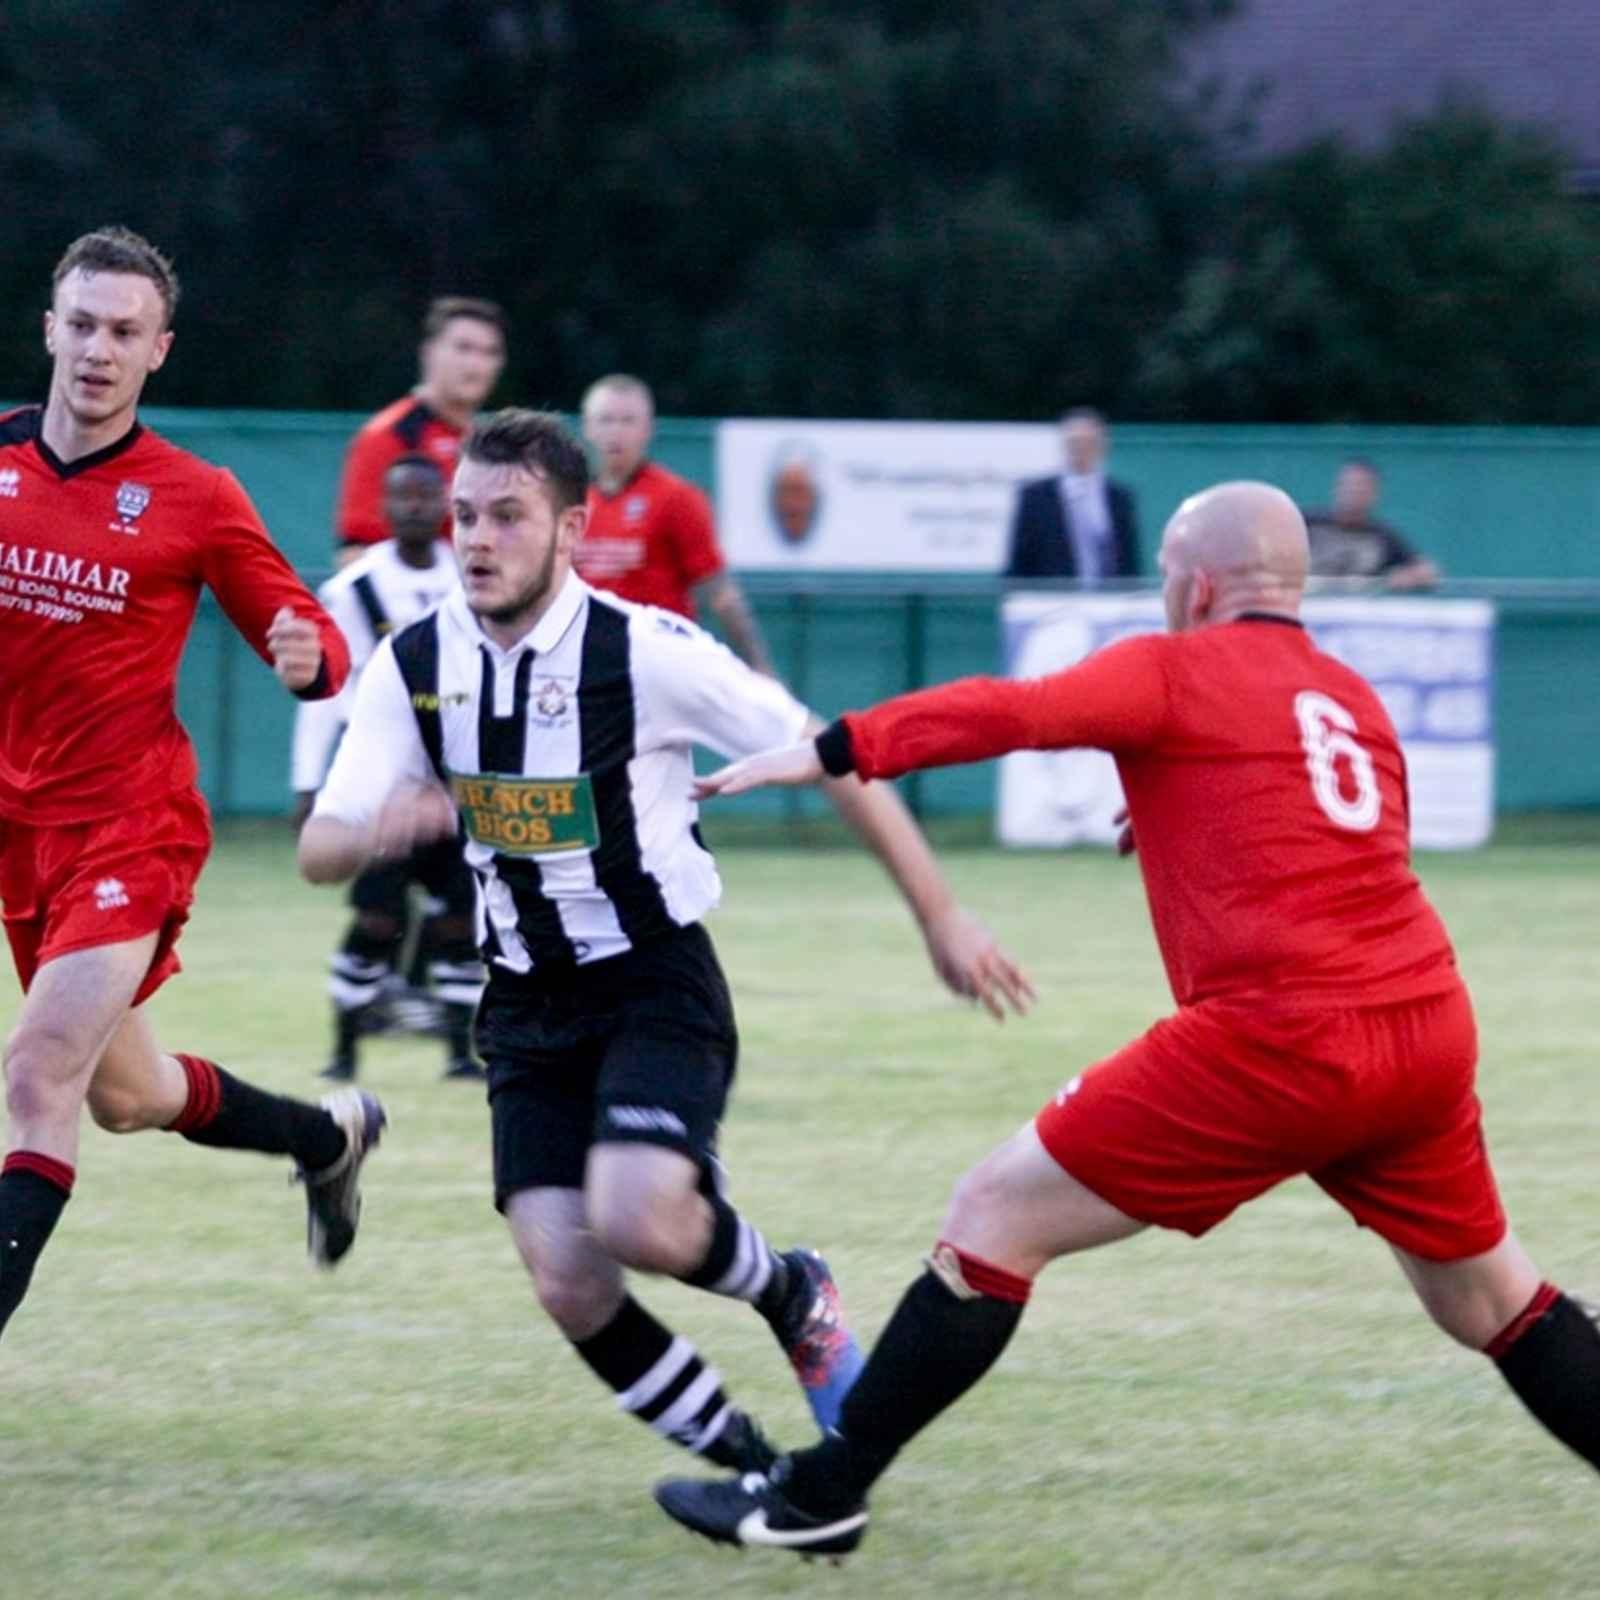 Star Reserves vs Bourne Town Reserves (3:1) by Tim Symonds